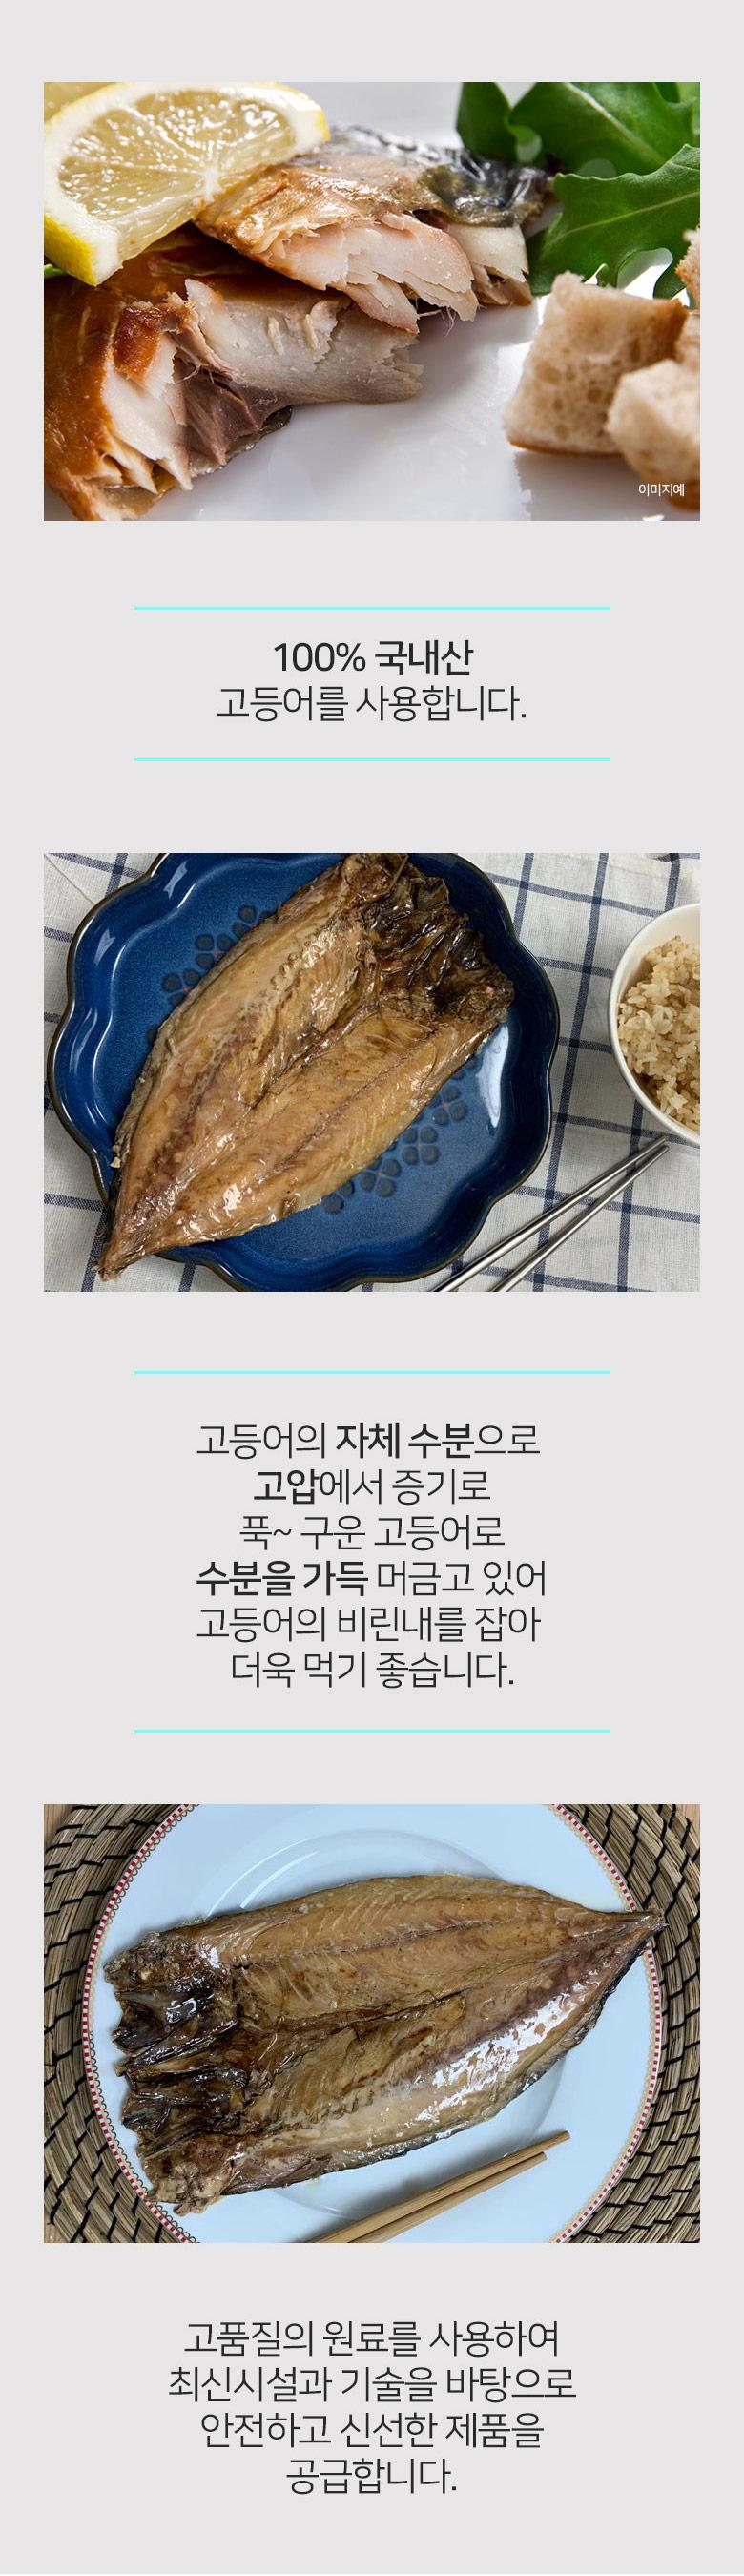 achim_whole_mackerel02_shop1_151822.jpg